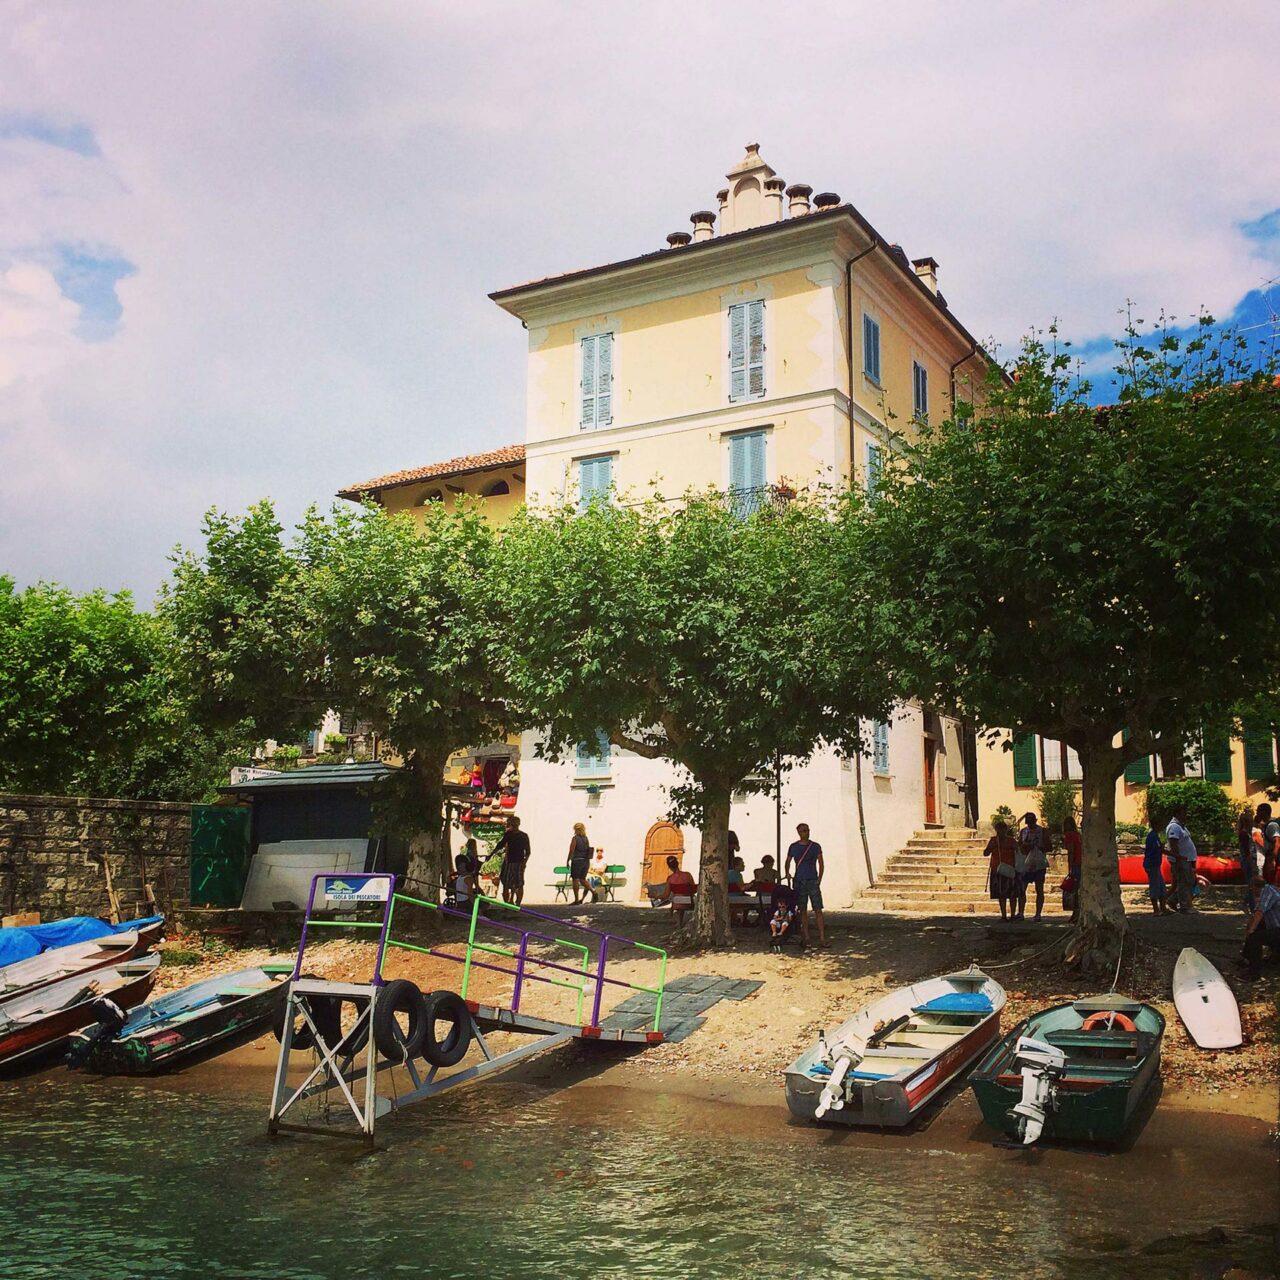 Sag beim Abschied leise Servus: Isola dei Pescatori im Lago Maggiore